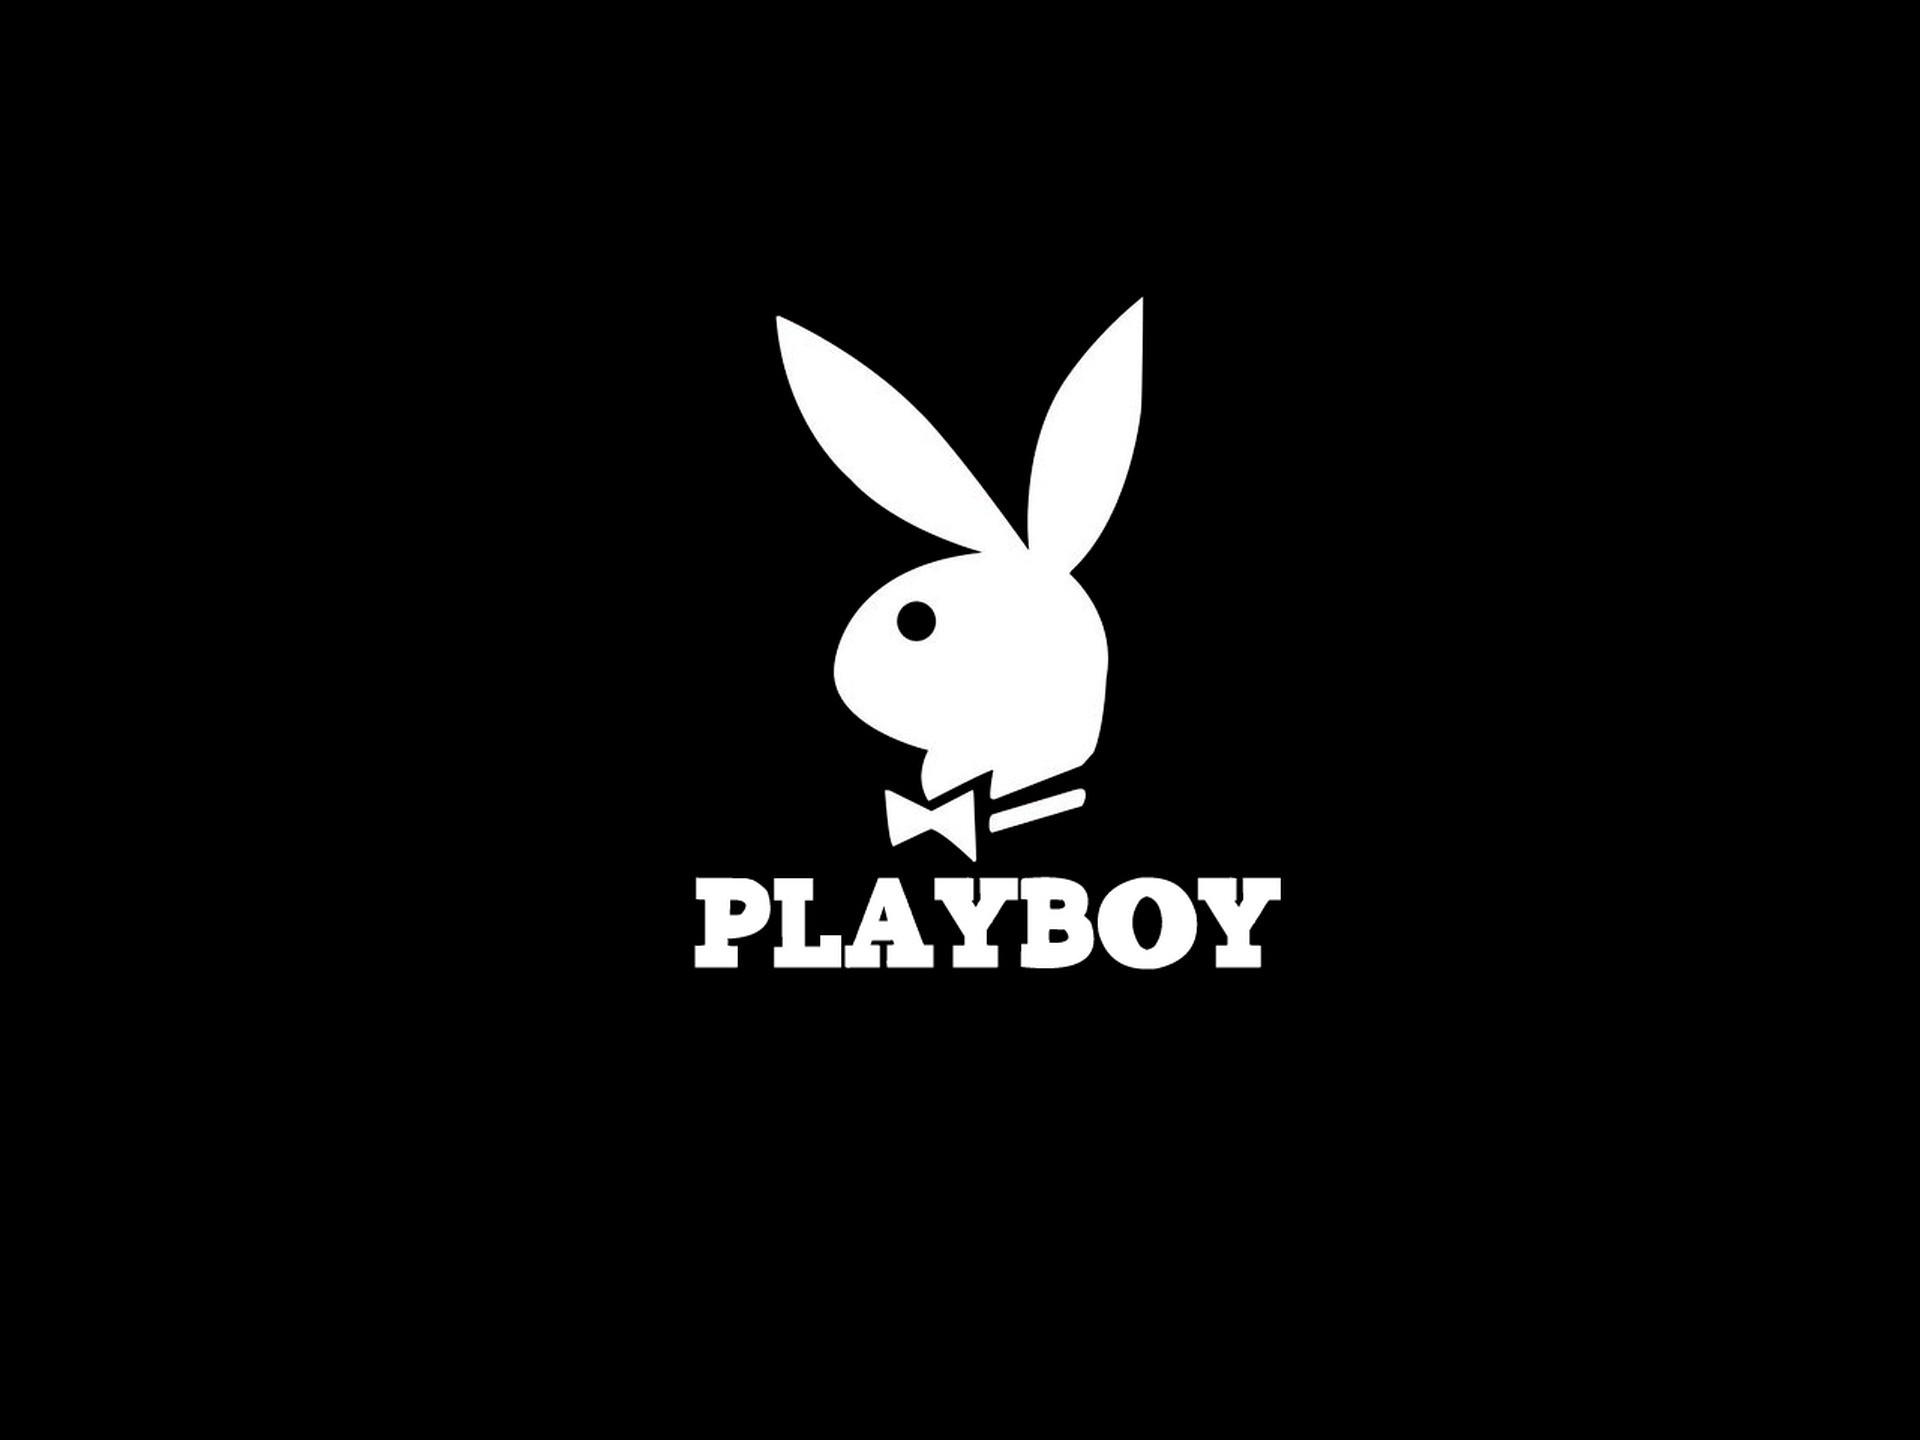 Playboy logo Wallpaper Brands Other